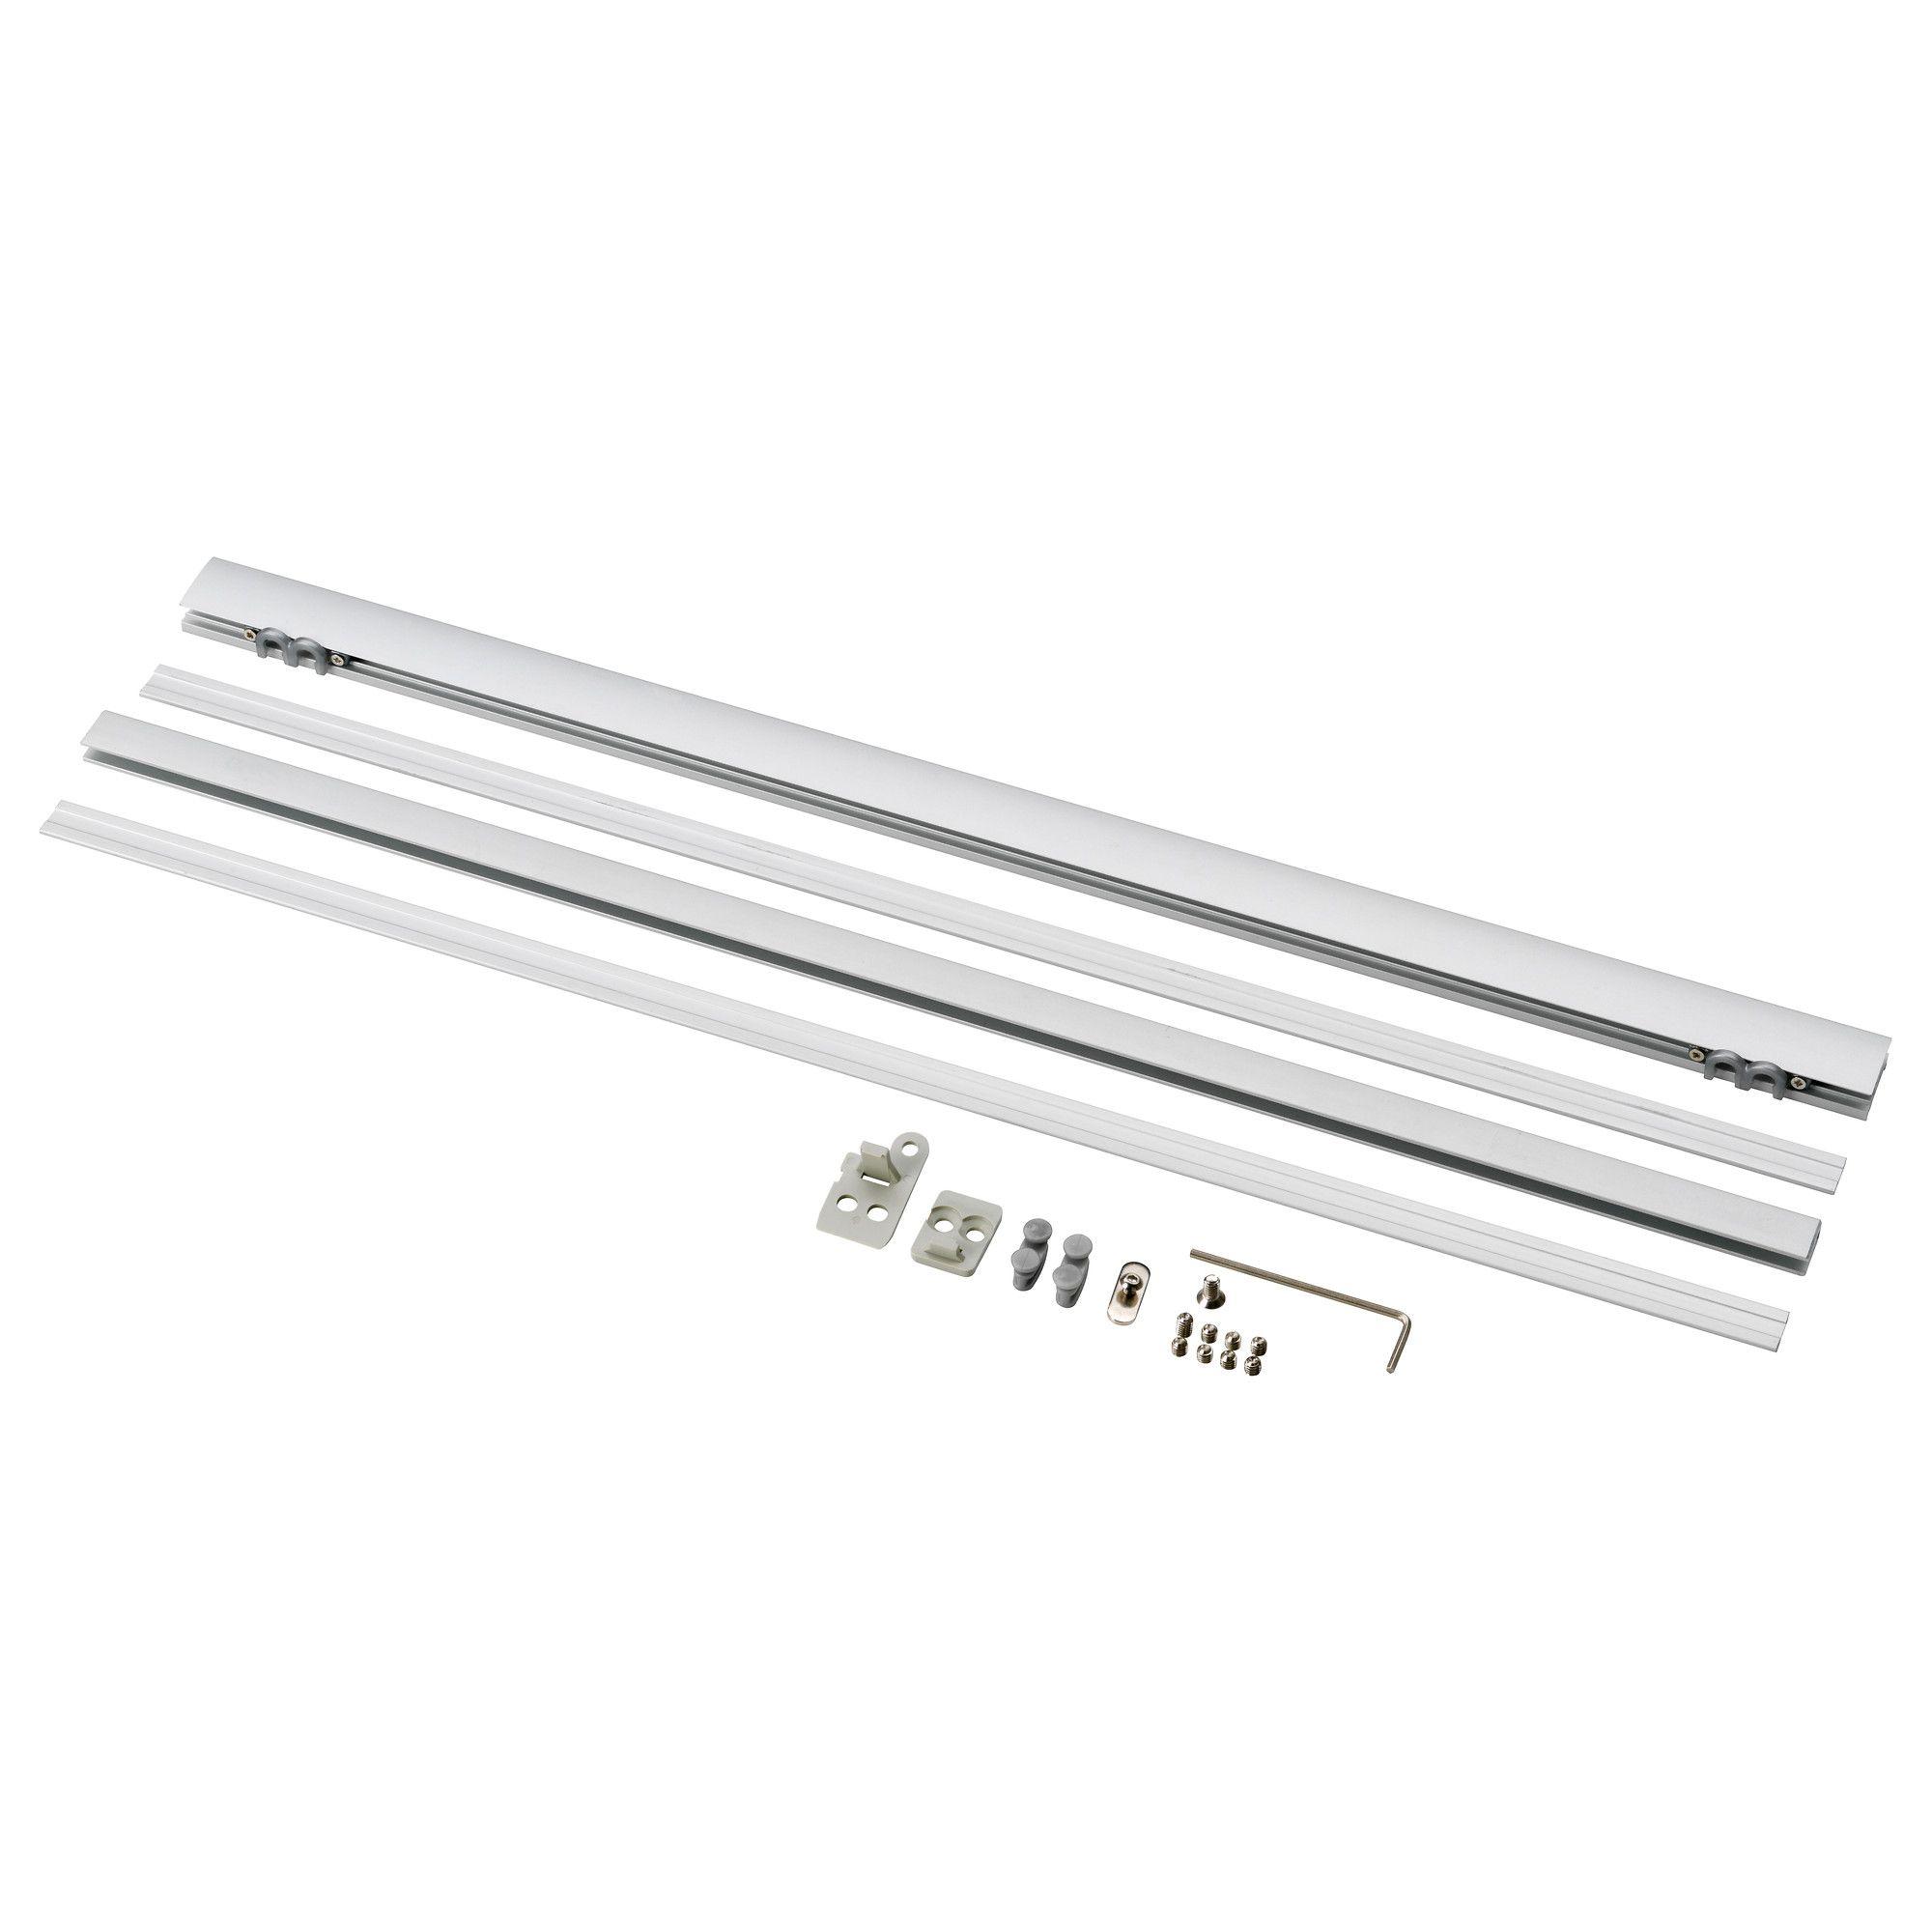 Kvartal Top And Bottom Rail Ikea 5 99 So Panel